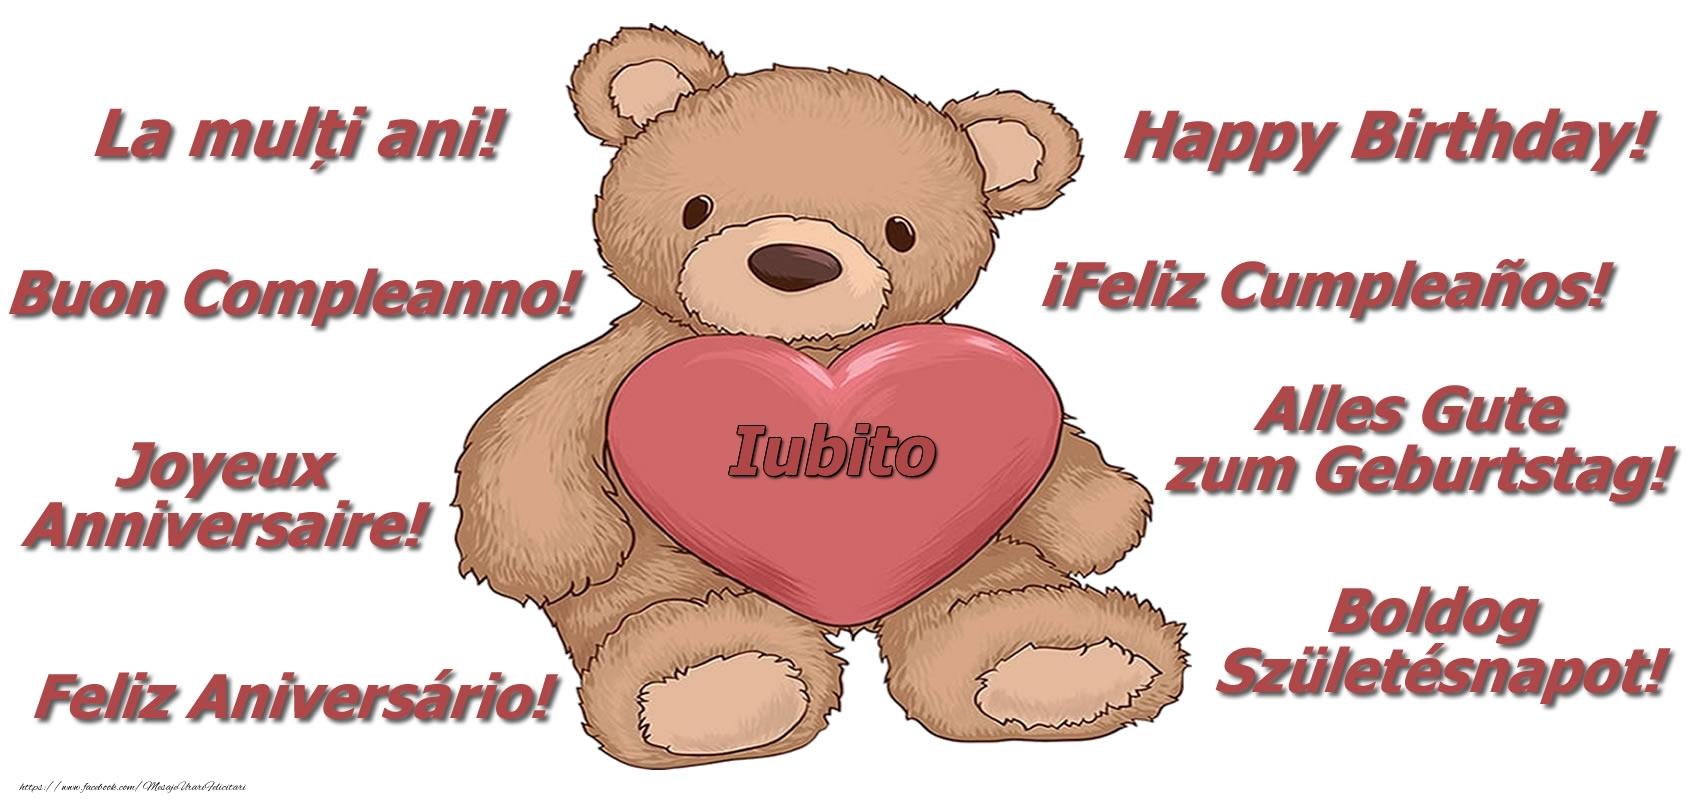 Felicitari frumoase de zi de nastere pentru Iubita | La multi ani iubito! - Ursulet